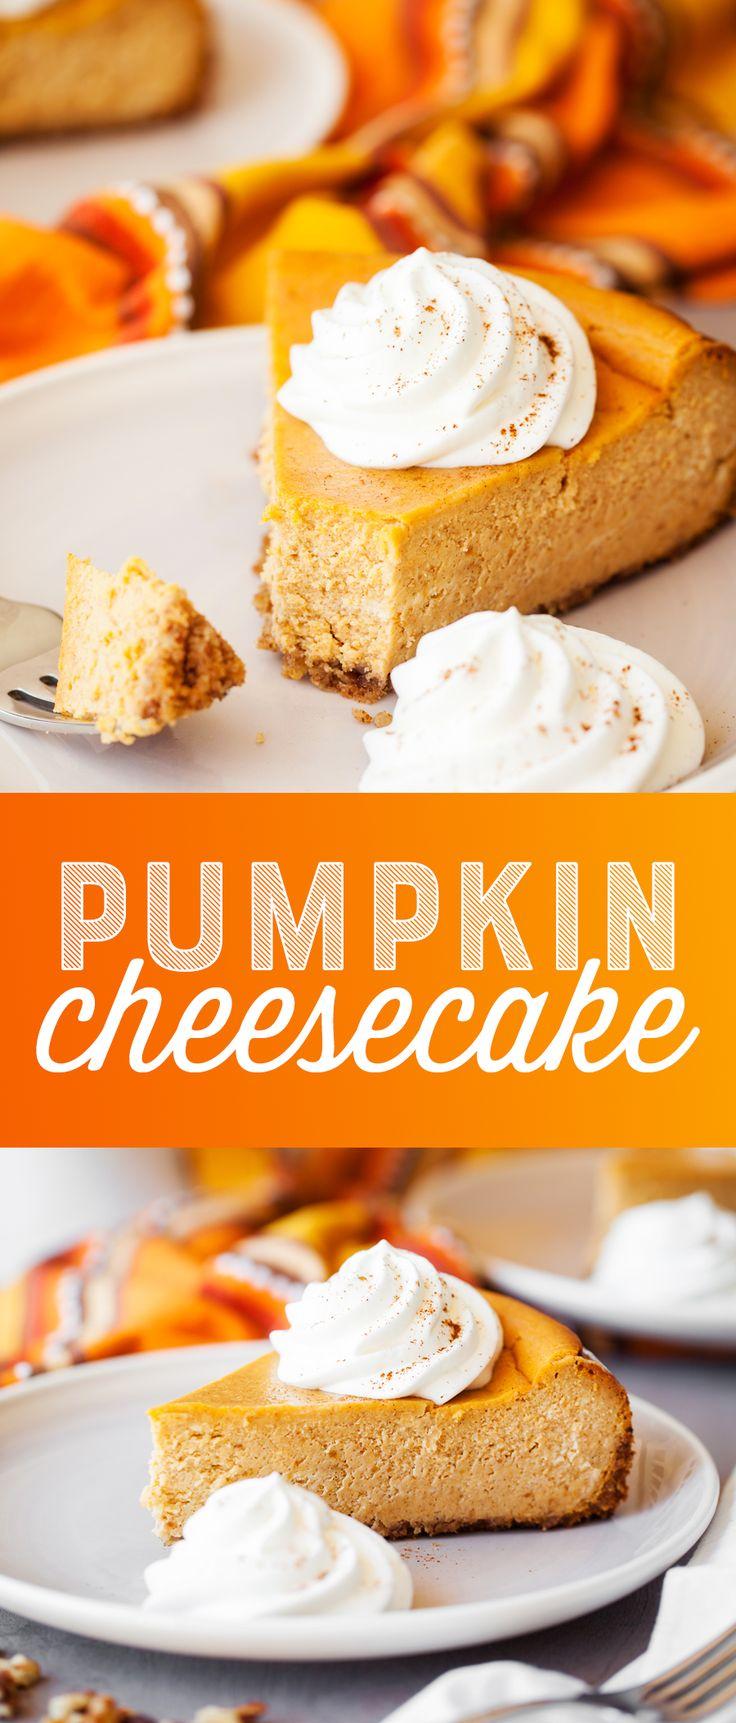 Pumpkin Cheesecake Recipe - This easy, creamy pump…